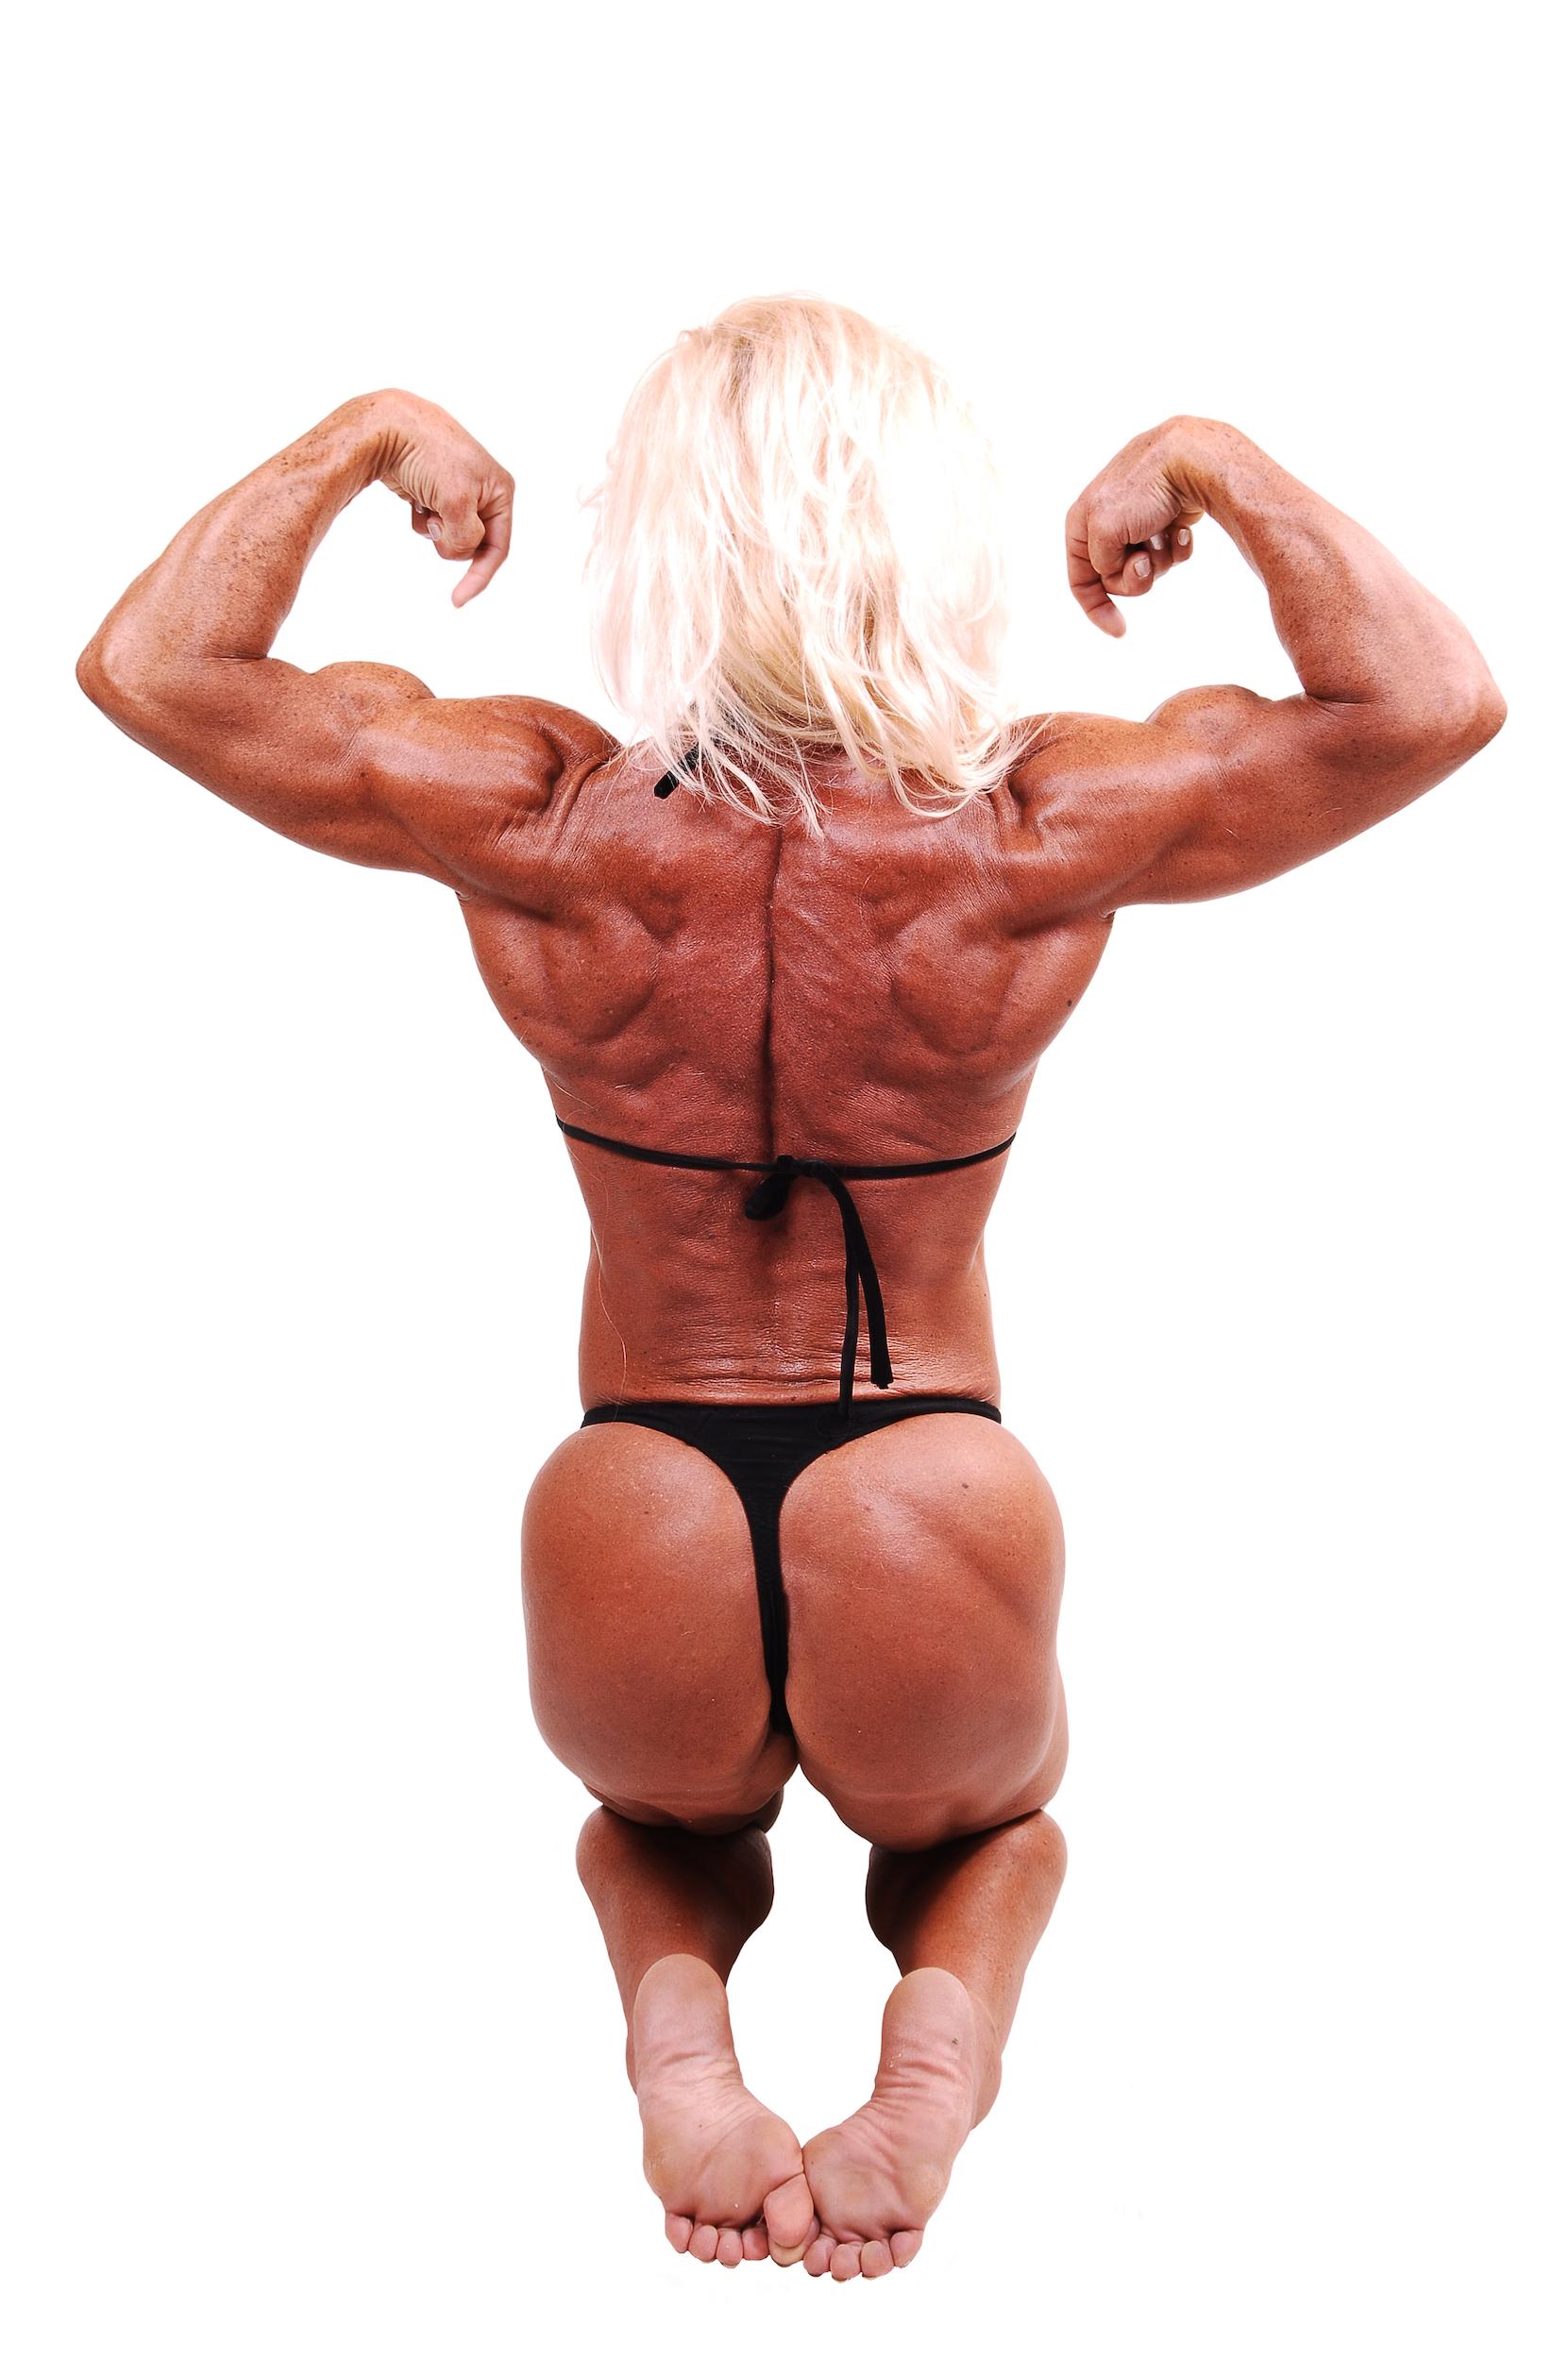 People 1661x2500 women white background bodybuilder glutes back muscular blonde flexing bikini barefoot muscles